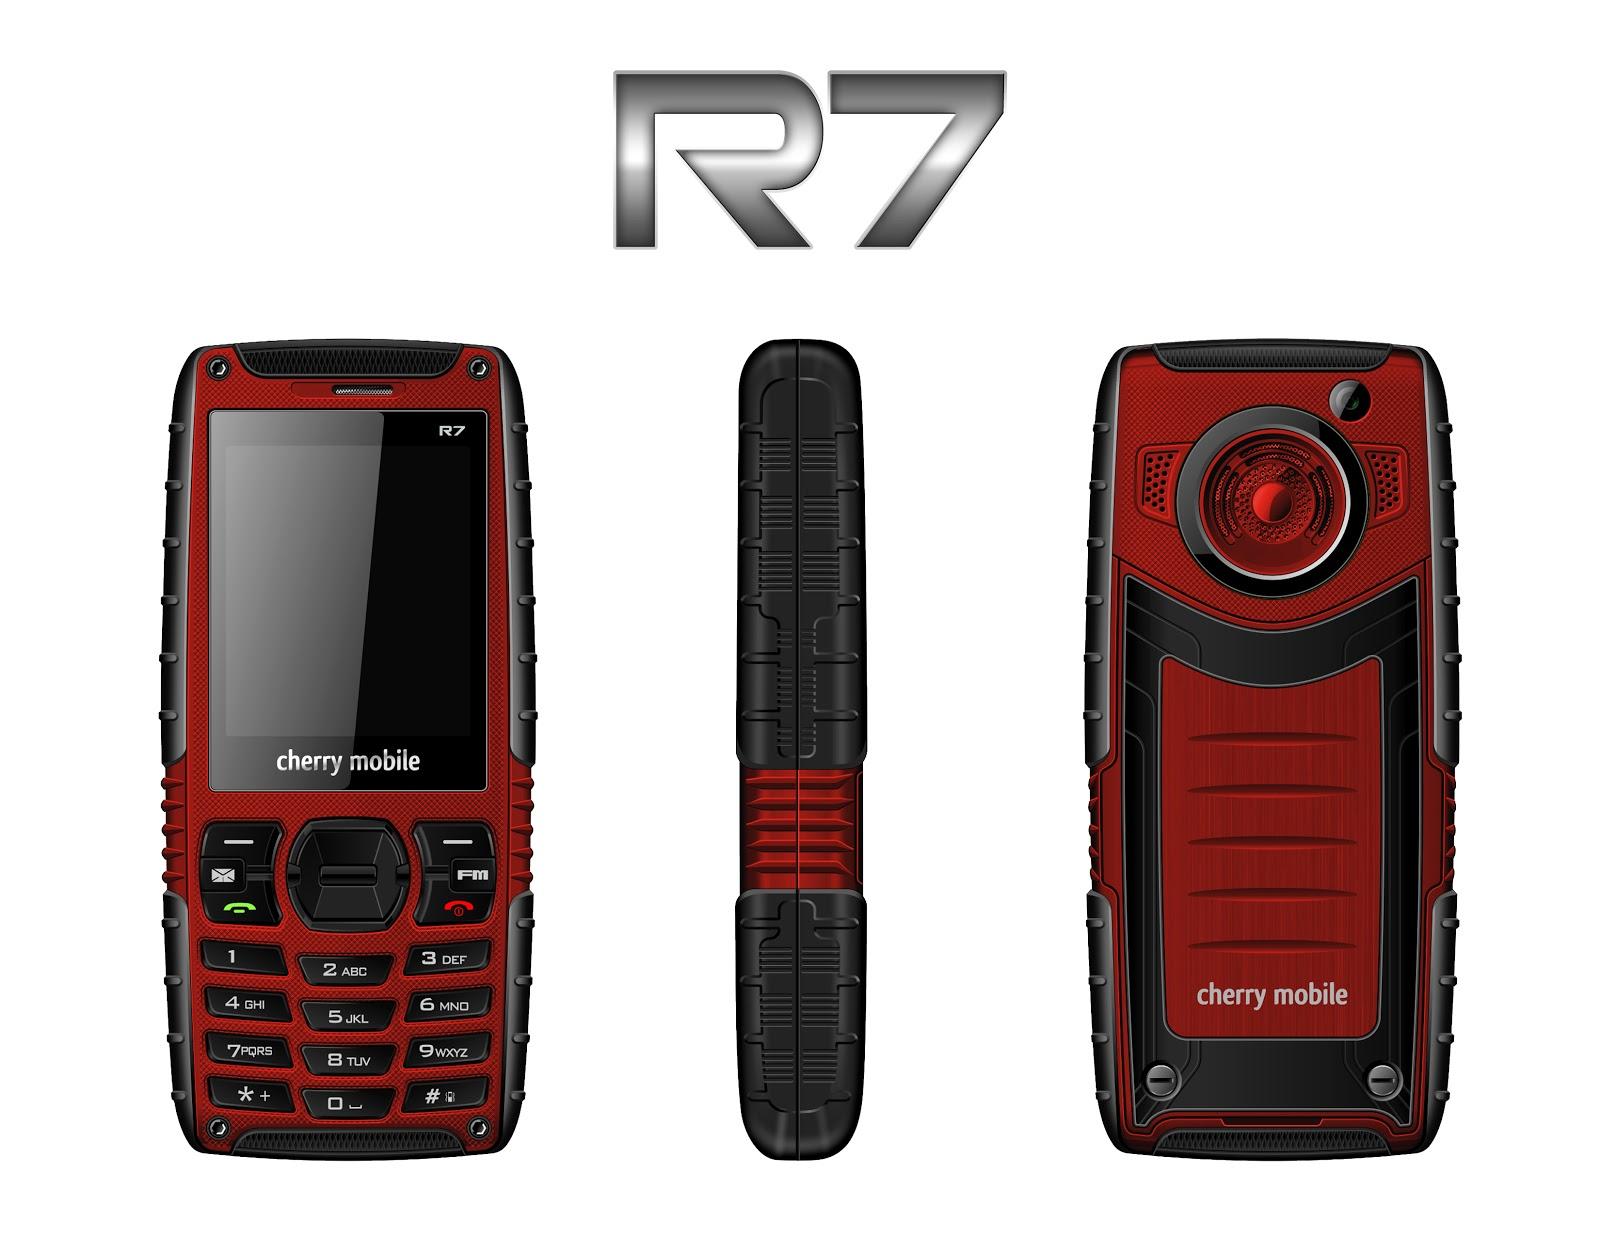 http://3.bp.blogspot.com/-r028X8wg_HI/TiFTvQdKW1I/AAAAAAAABic/pg07_82ImgE/s1600/Pao--Cherry+Mobile+R7+%2528Vigor%2529.jpg